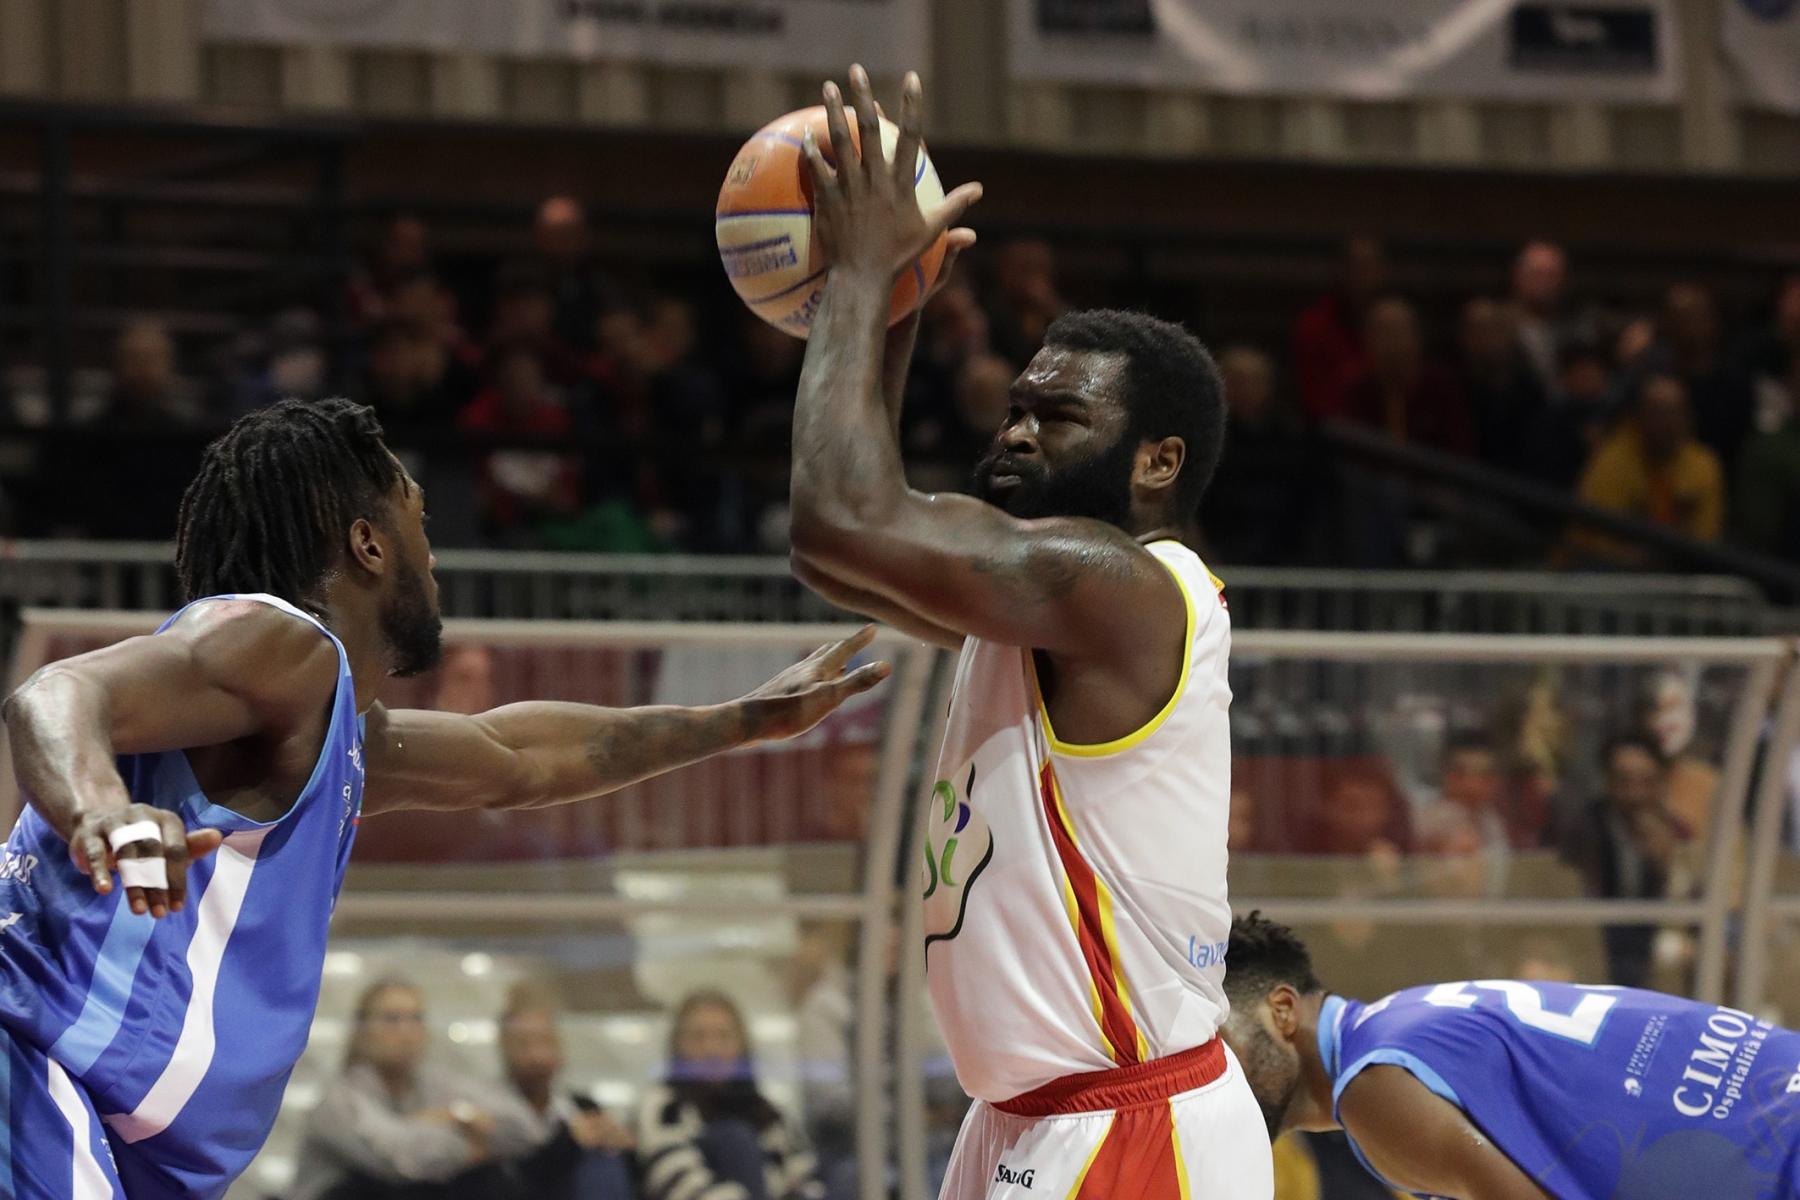 LNP serie A2 nona giornata.  OraSì Basket Ravenna - Sapori Veri Roseto.